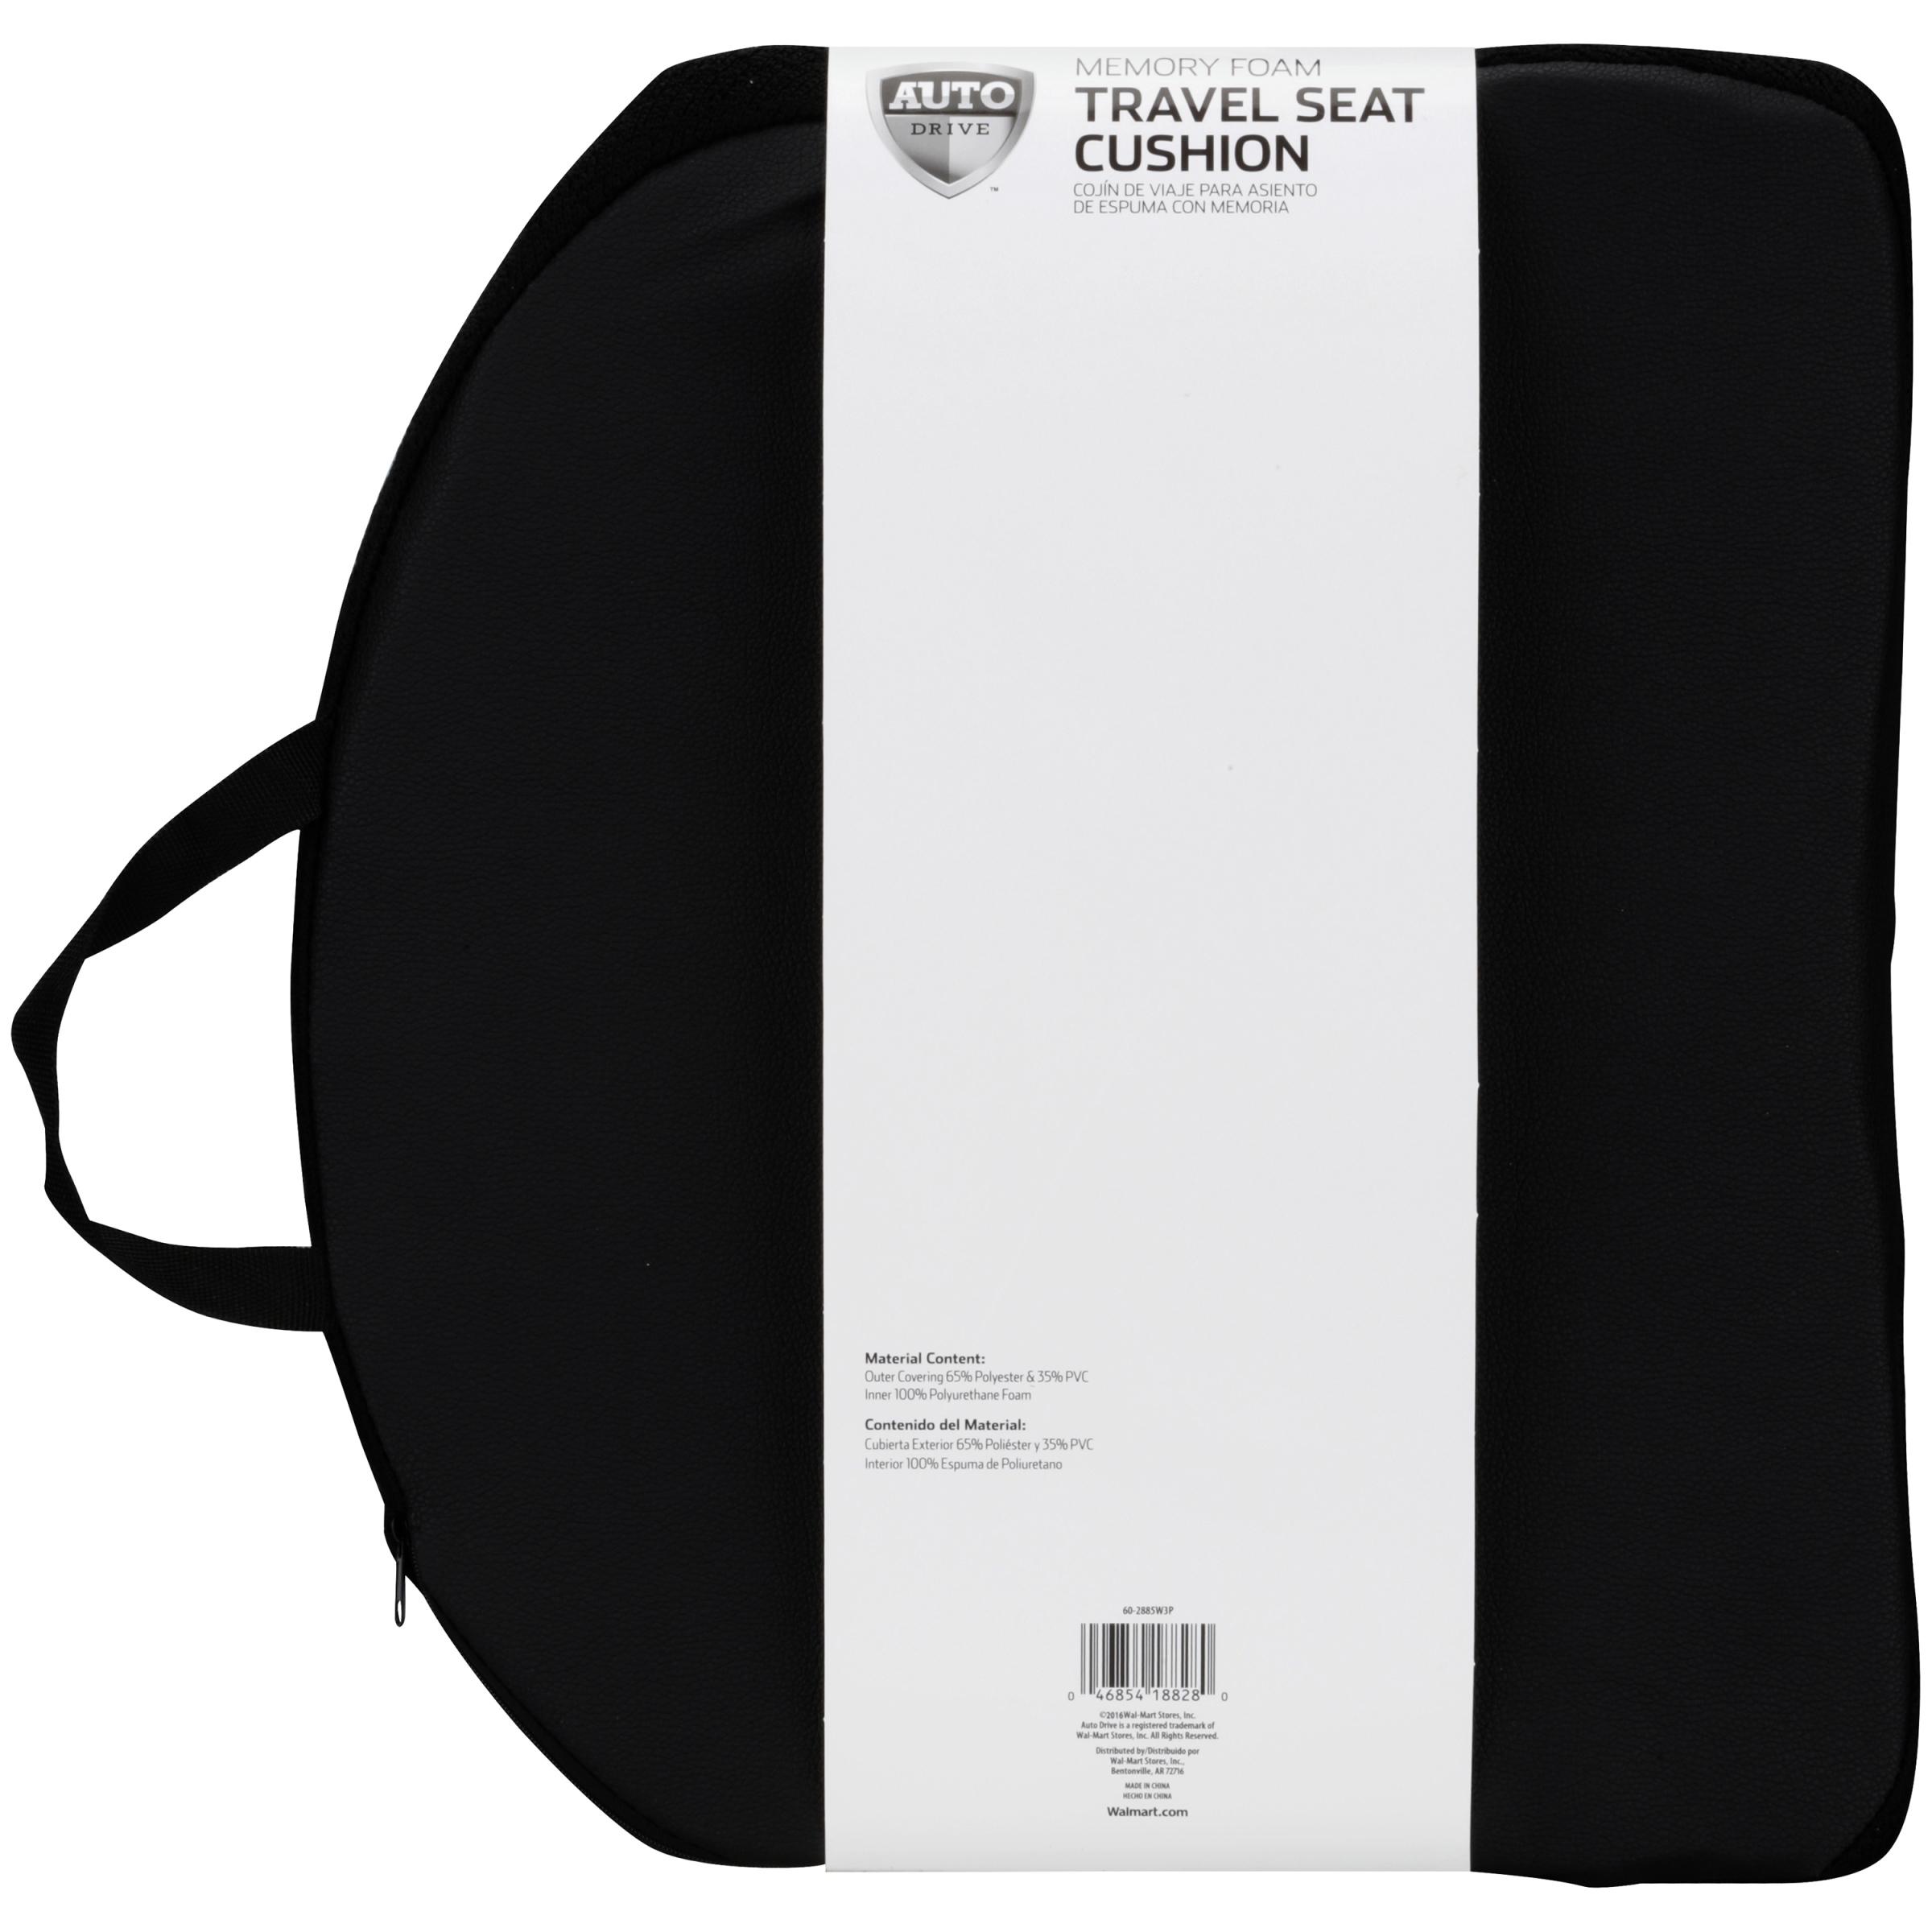 Auto Drive Travel Memory Foam Seat Cushion - Walmart com